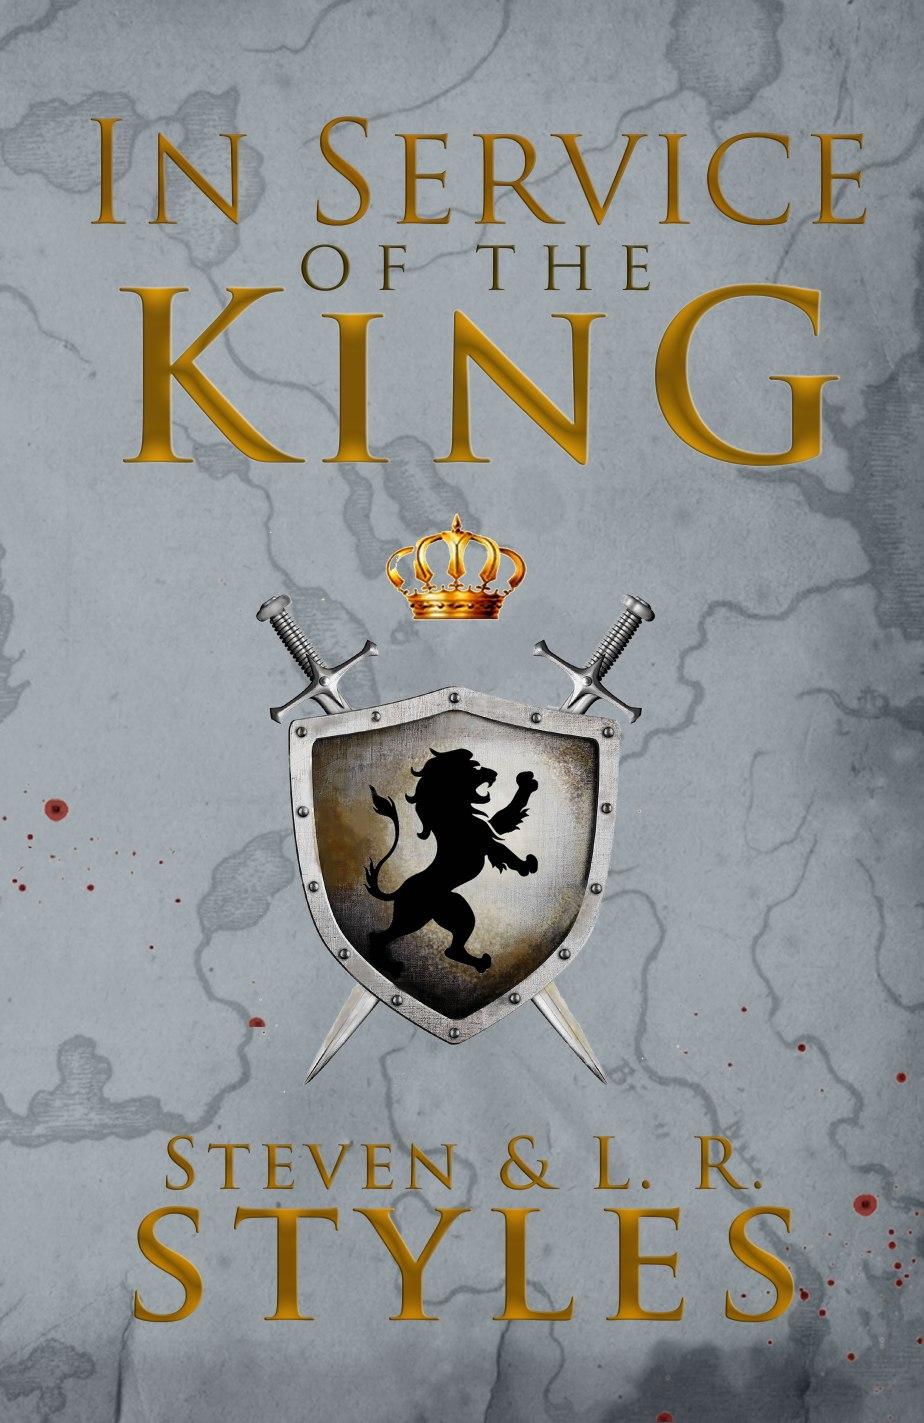 https://www.amazon.com/Service-King-Quests-Joseph-Kingdom-ebook/dp/B00IH8IQEO/ref=asap_bc?ie=UTF8